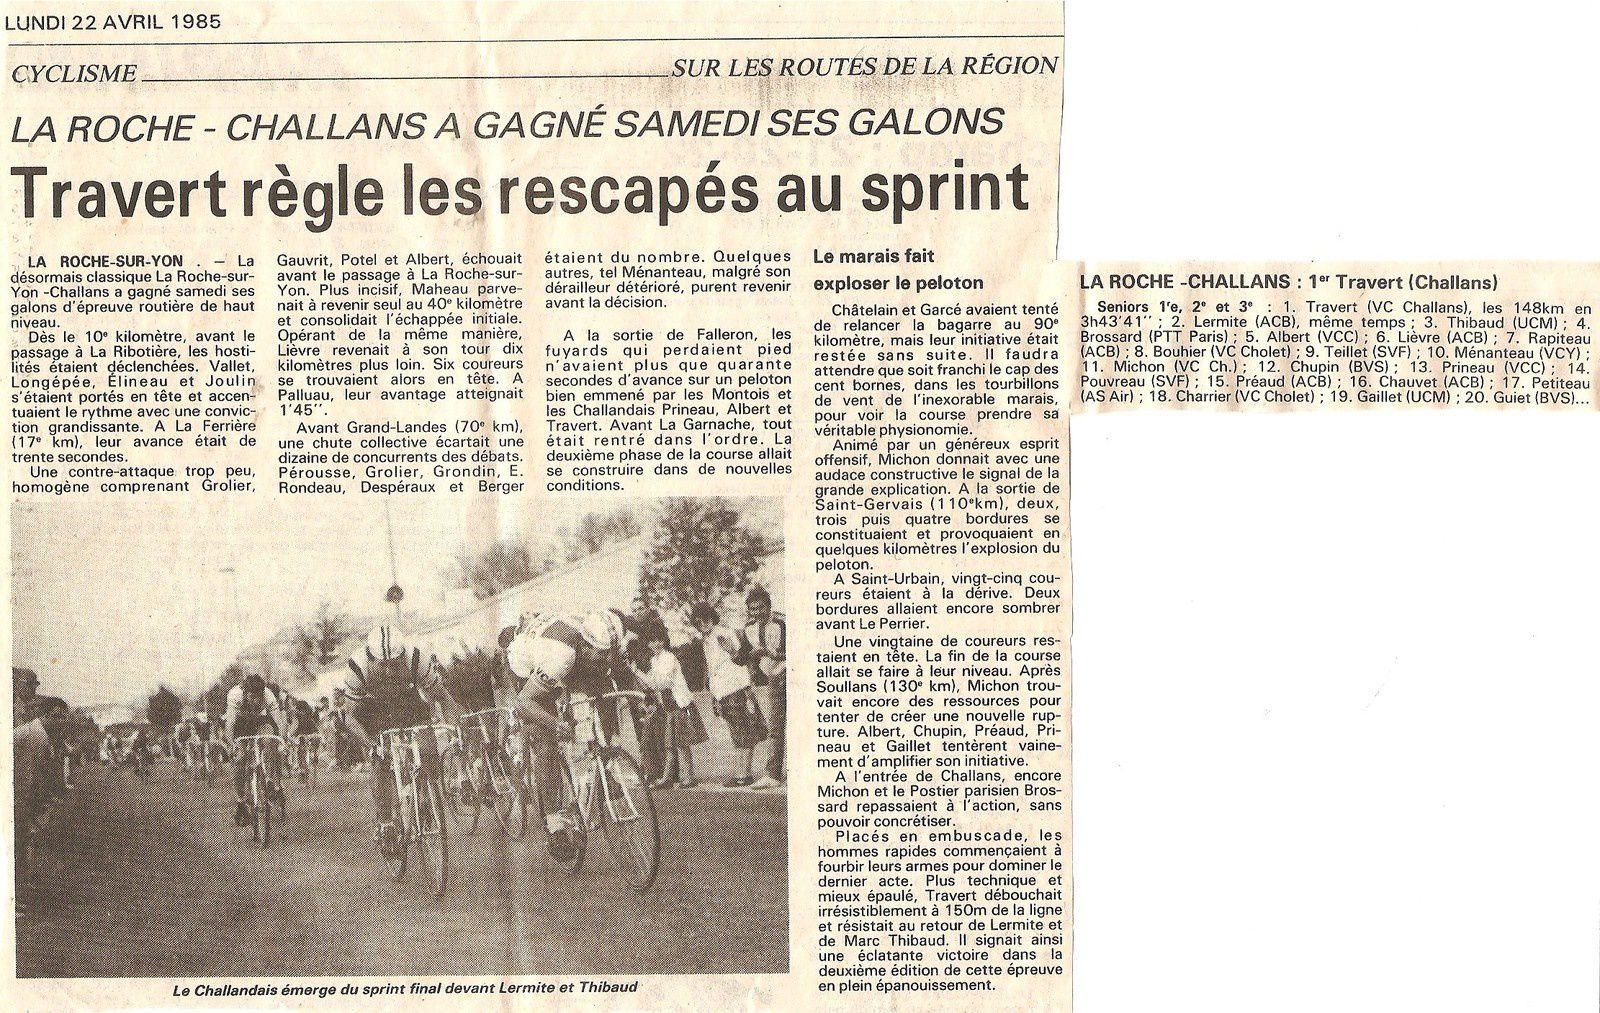 La Roche - Challans en 1985.